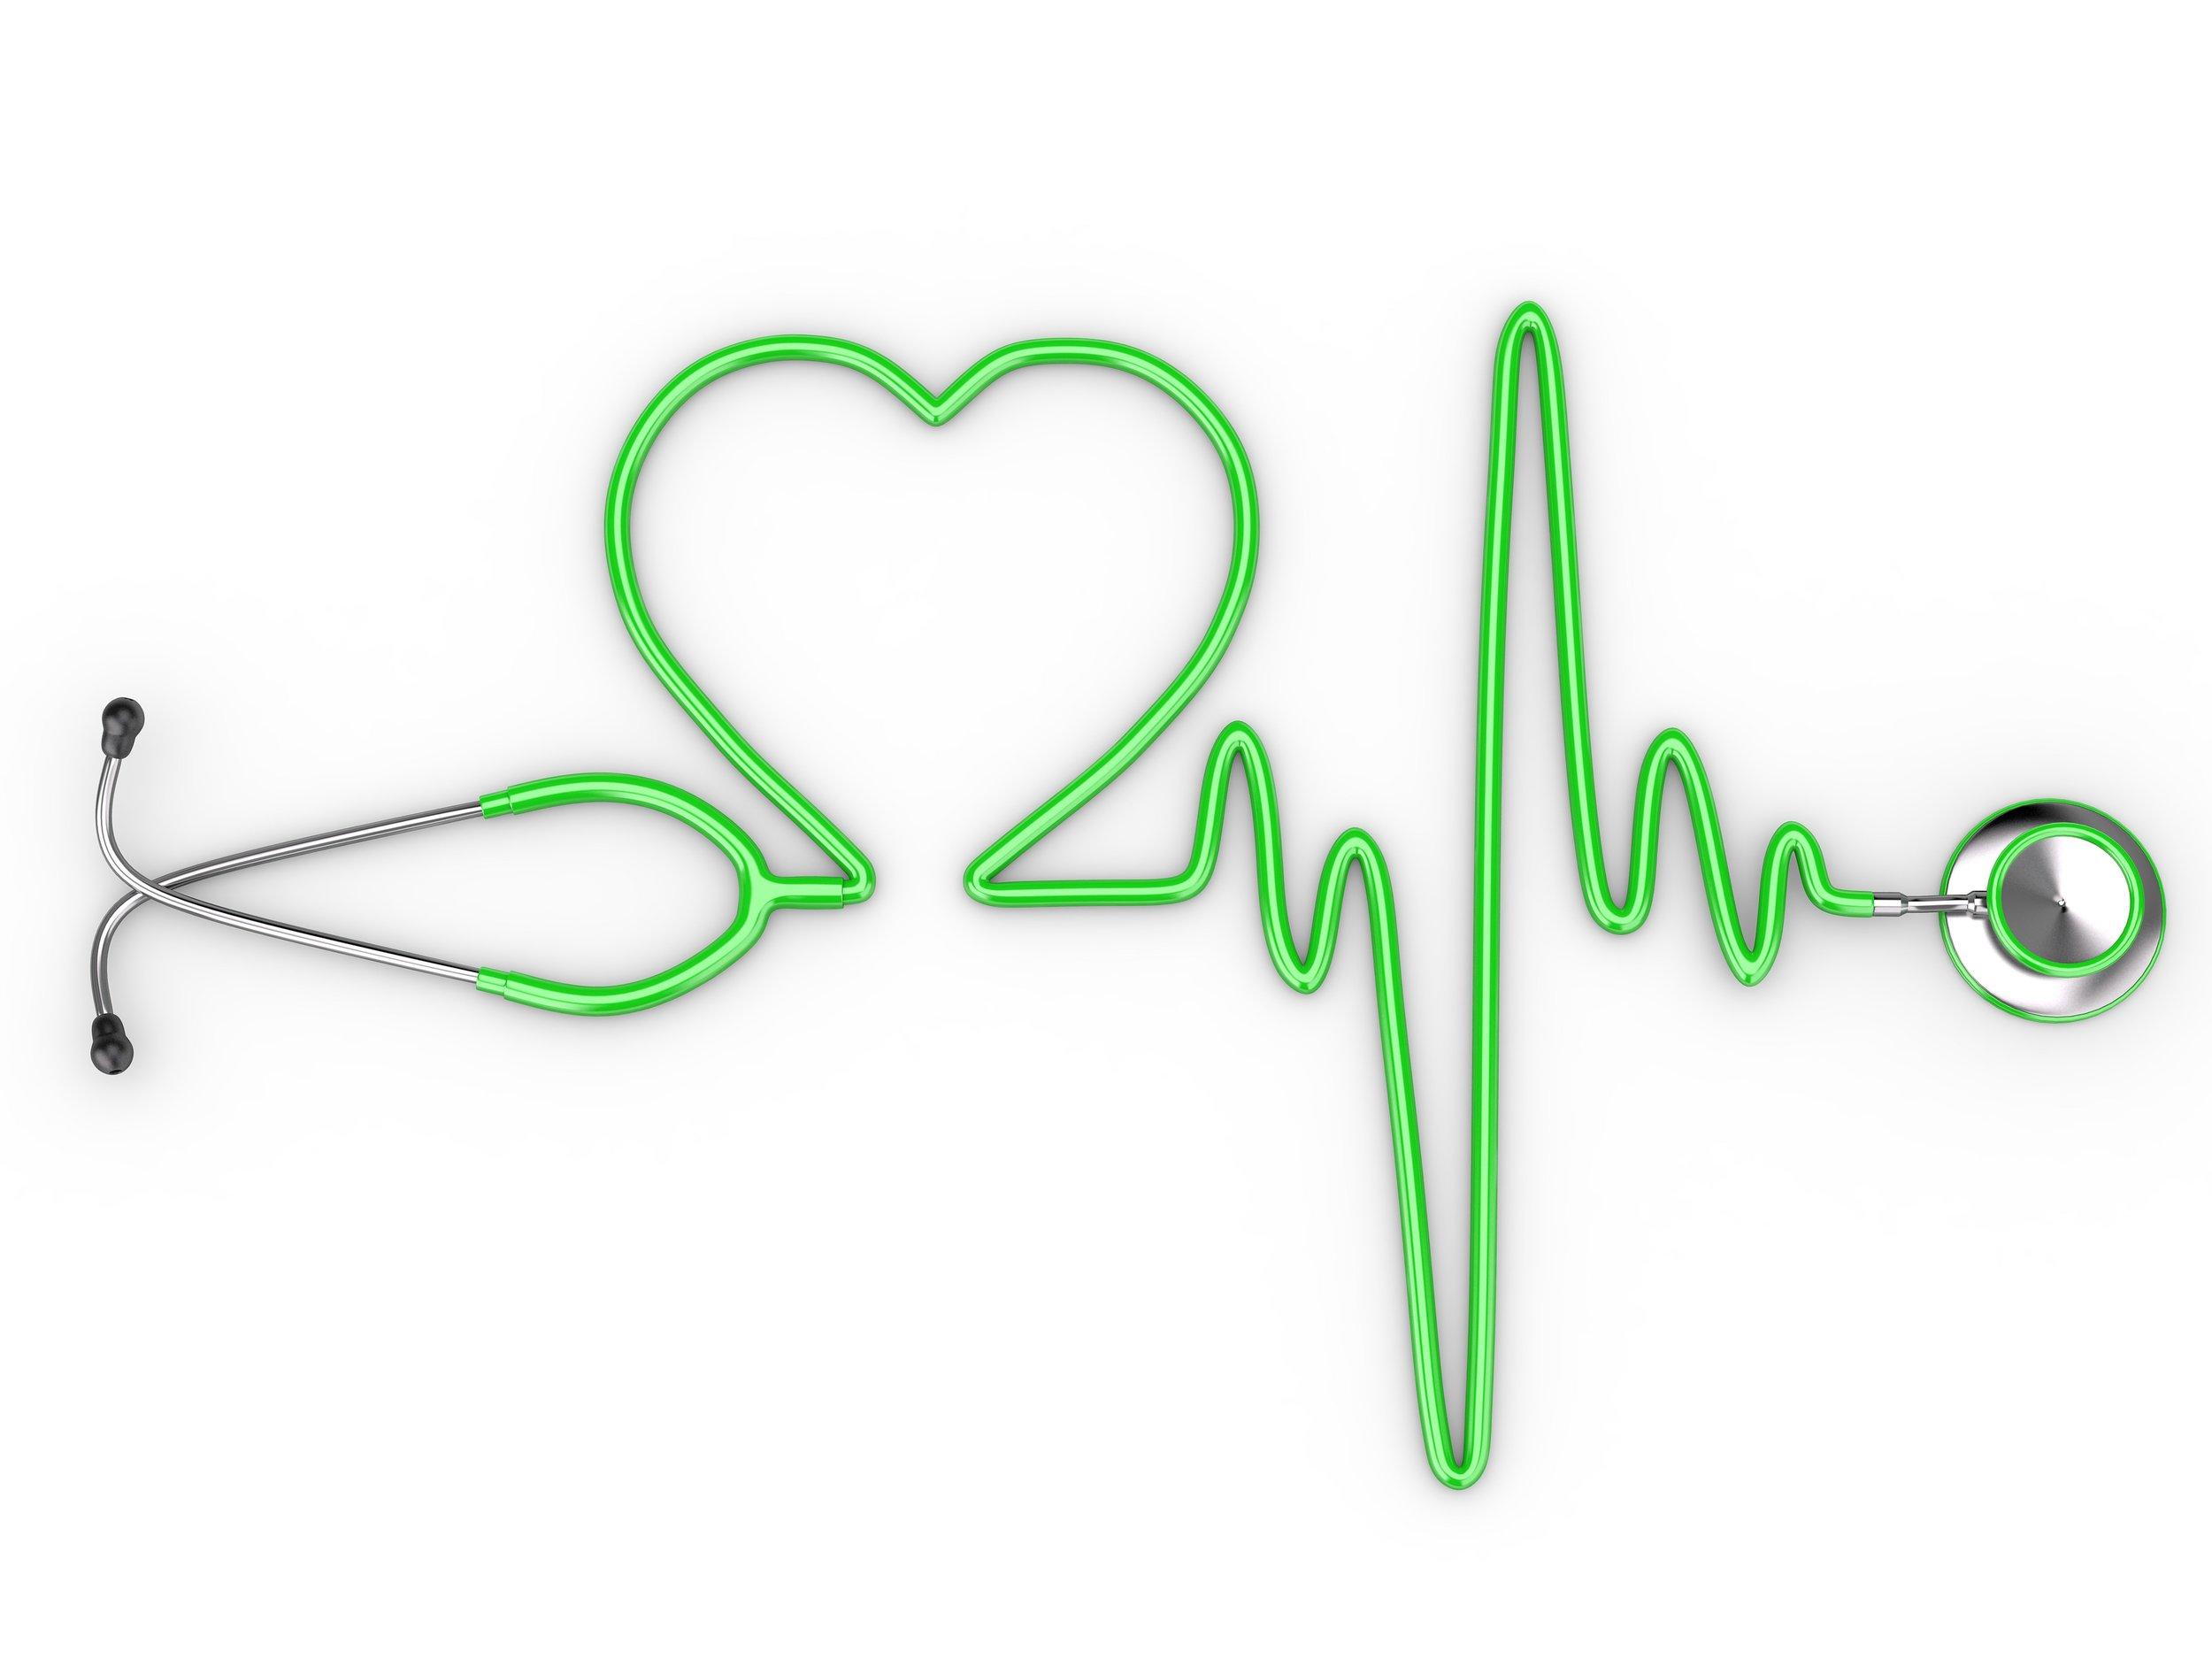 Heart Graph Line Shaped Stethoscope Medical Health Doctor.jpg